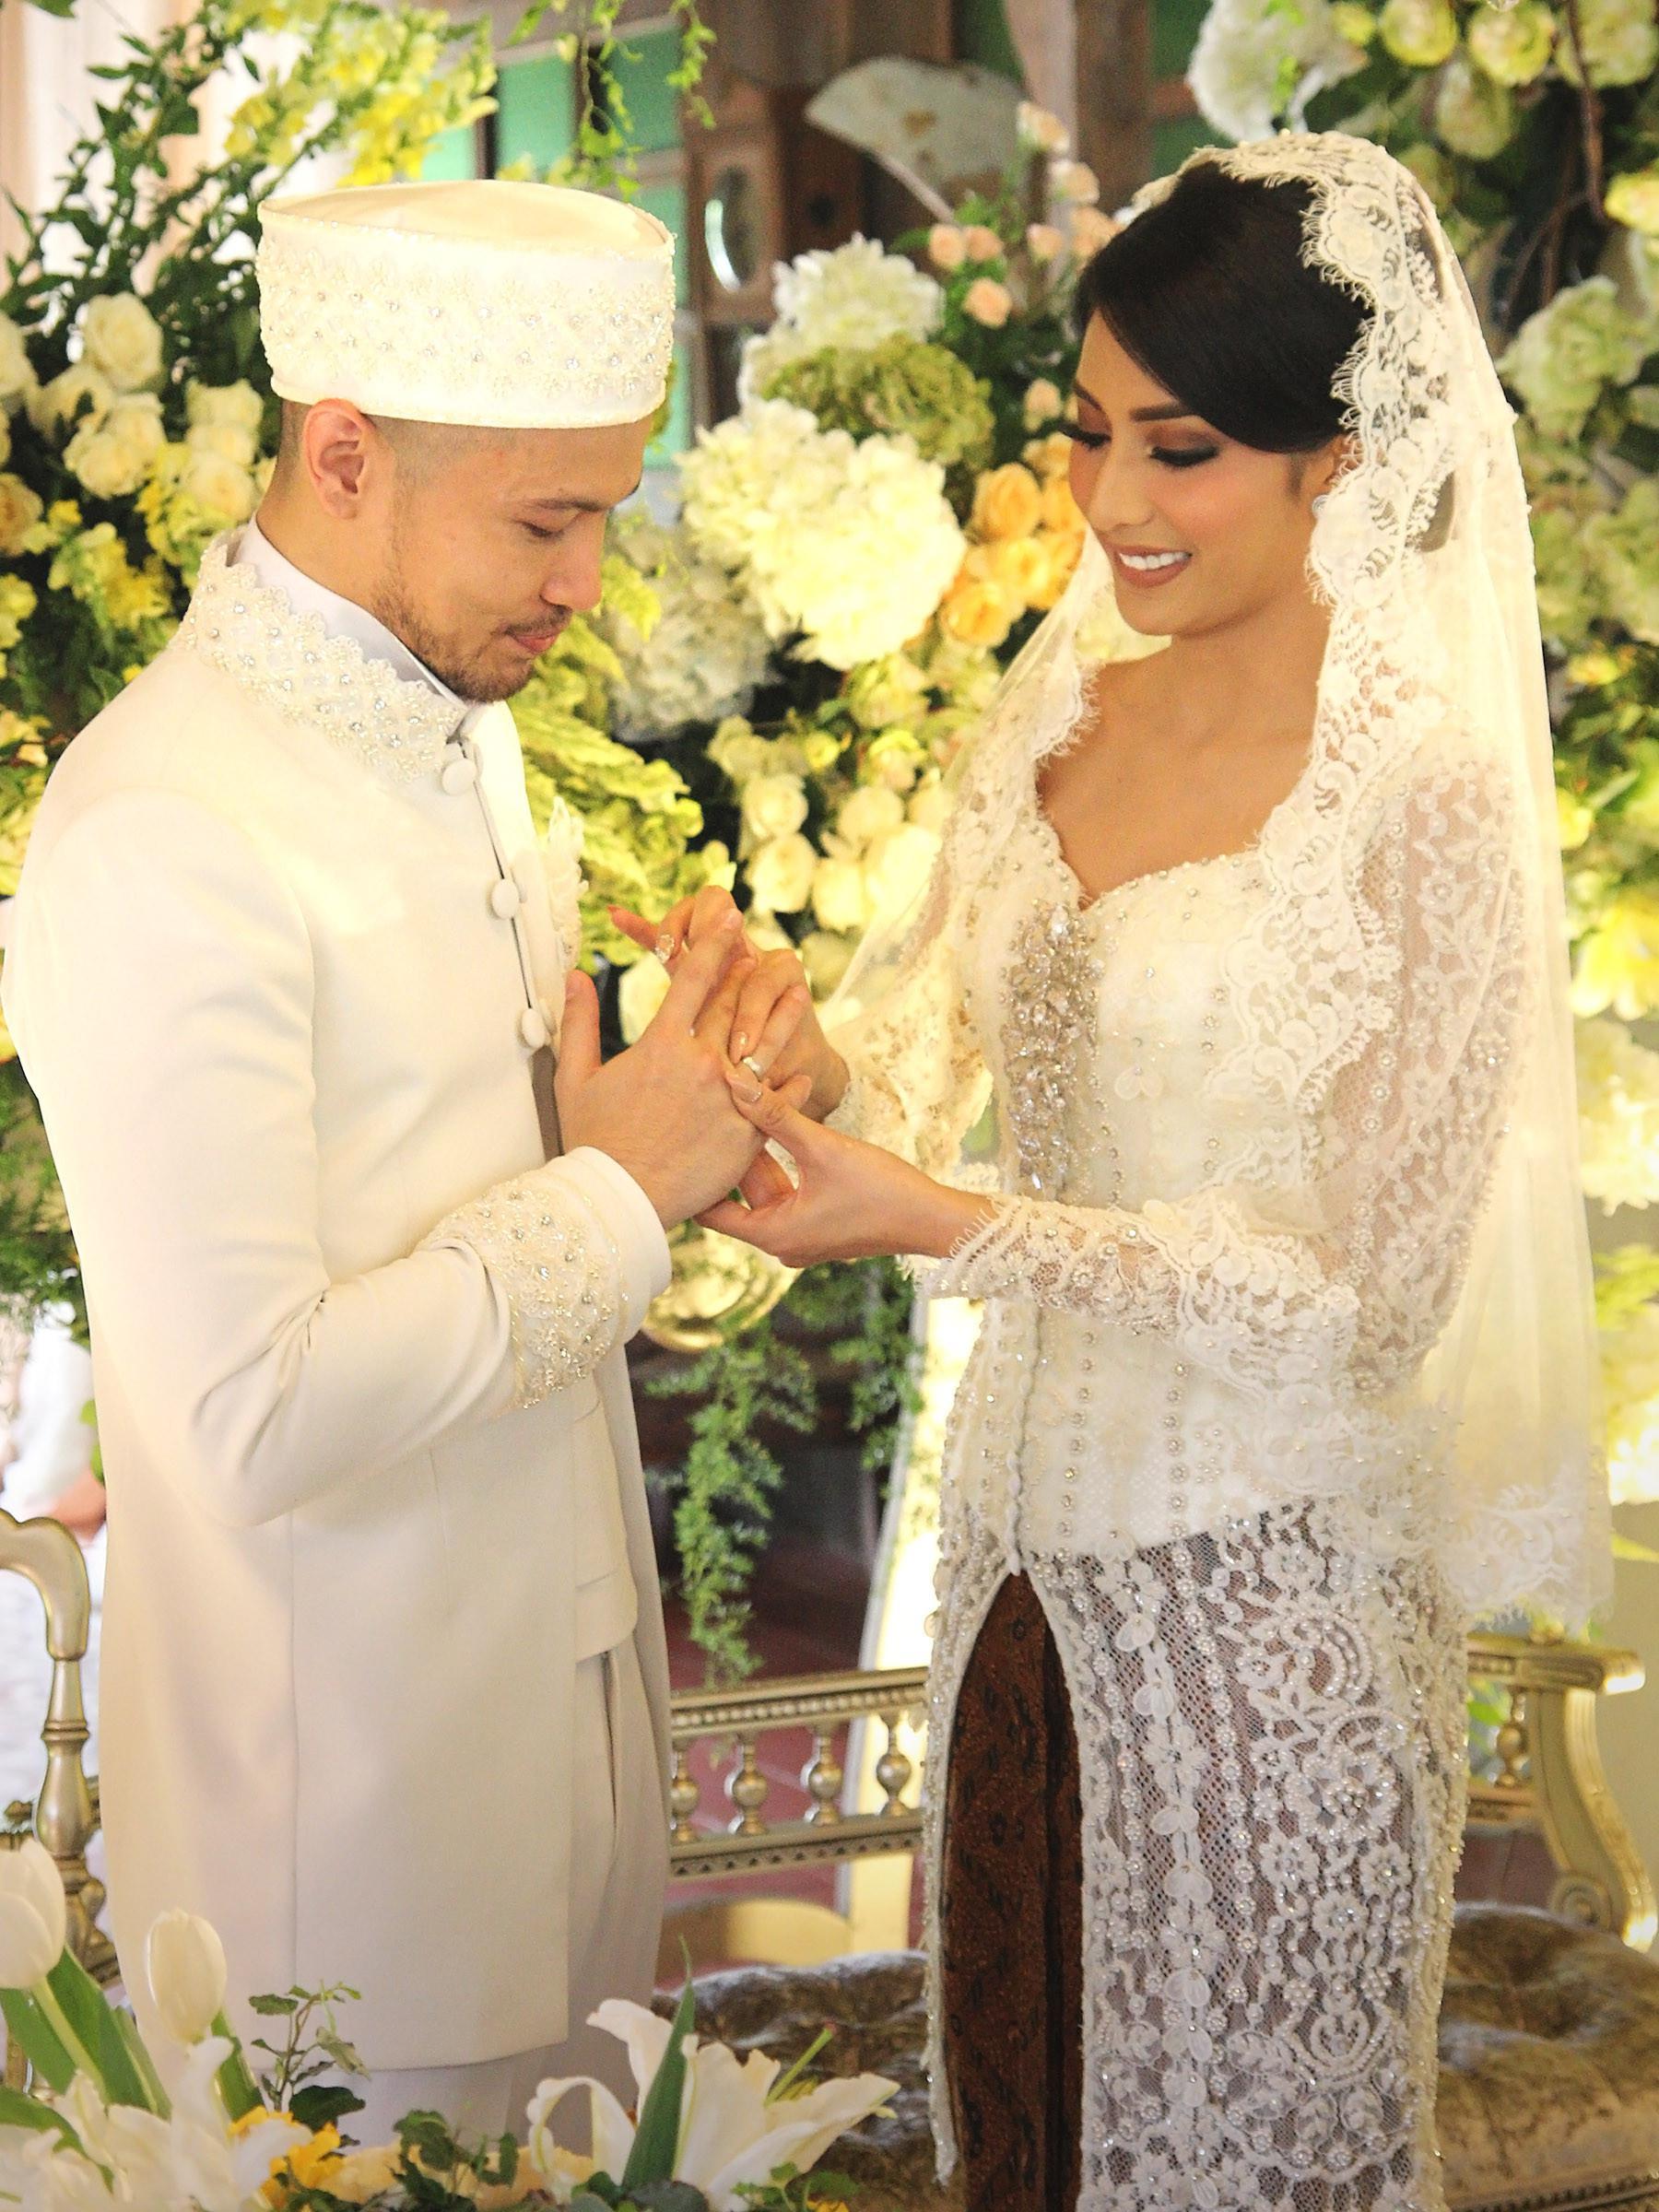 Tyas Mirasih resmi menjadi istri dari musisi Raiden Soedjono pada Sabtu (8/7/2017) siang. Setelah selesai akad nikah, pasangan ini akan menggelar resepsi pernikahan di tempat yang sama pada malam harinya. (Bambang E. Ros/Bintang.com)